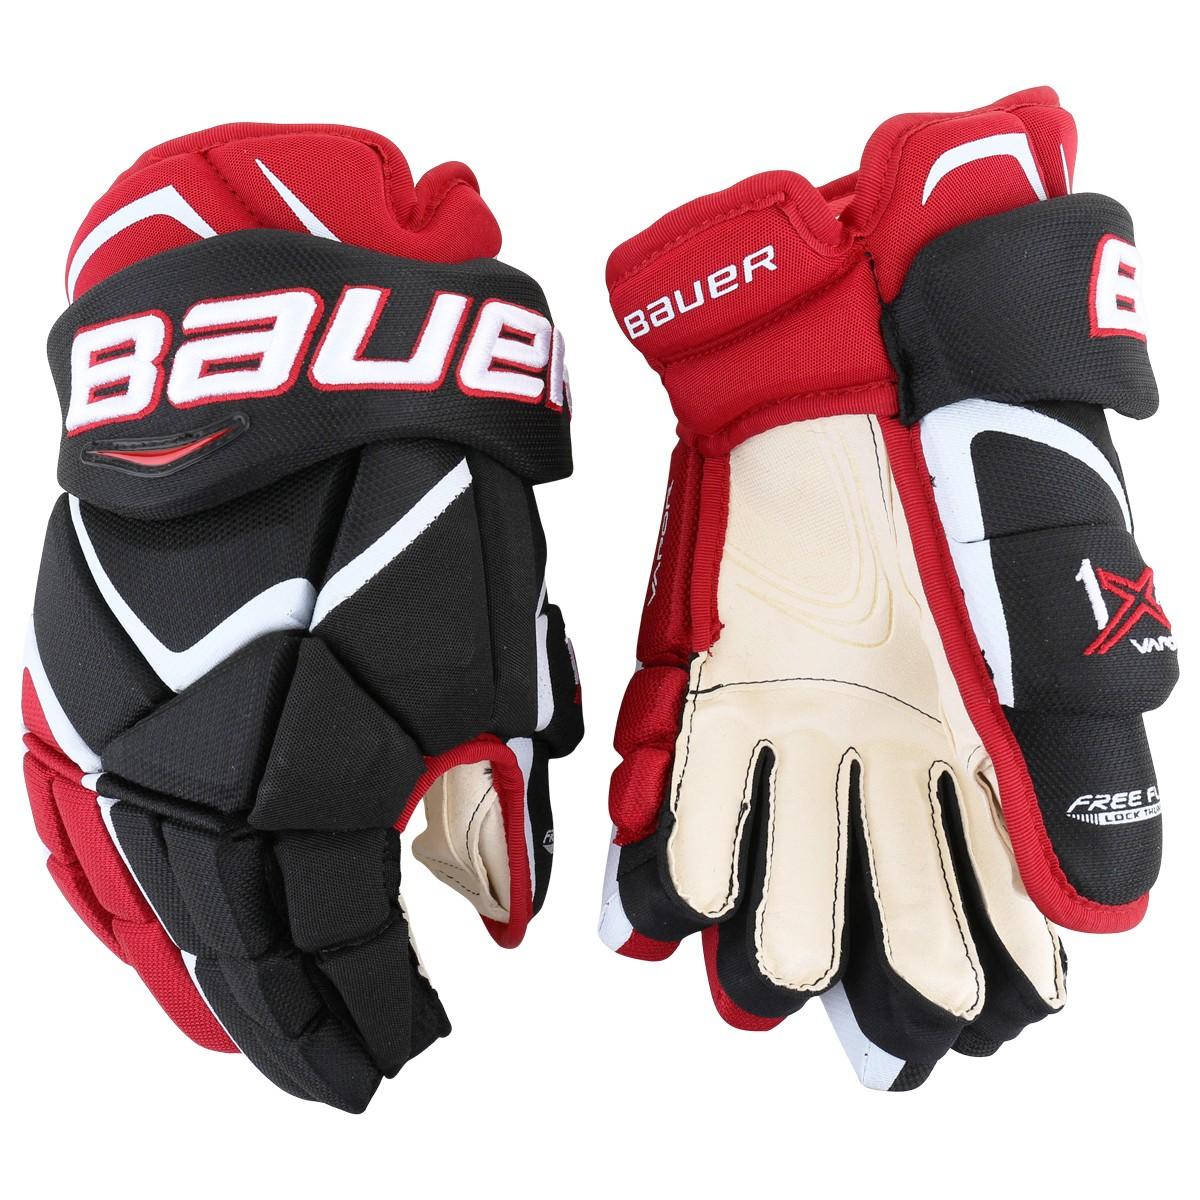 vapor 1x pro  gloves